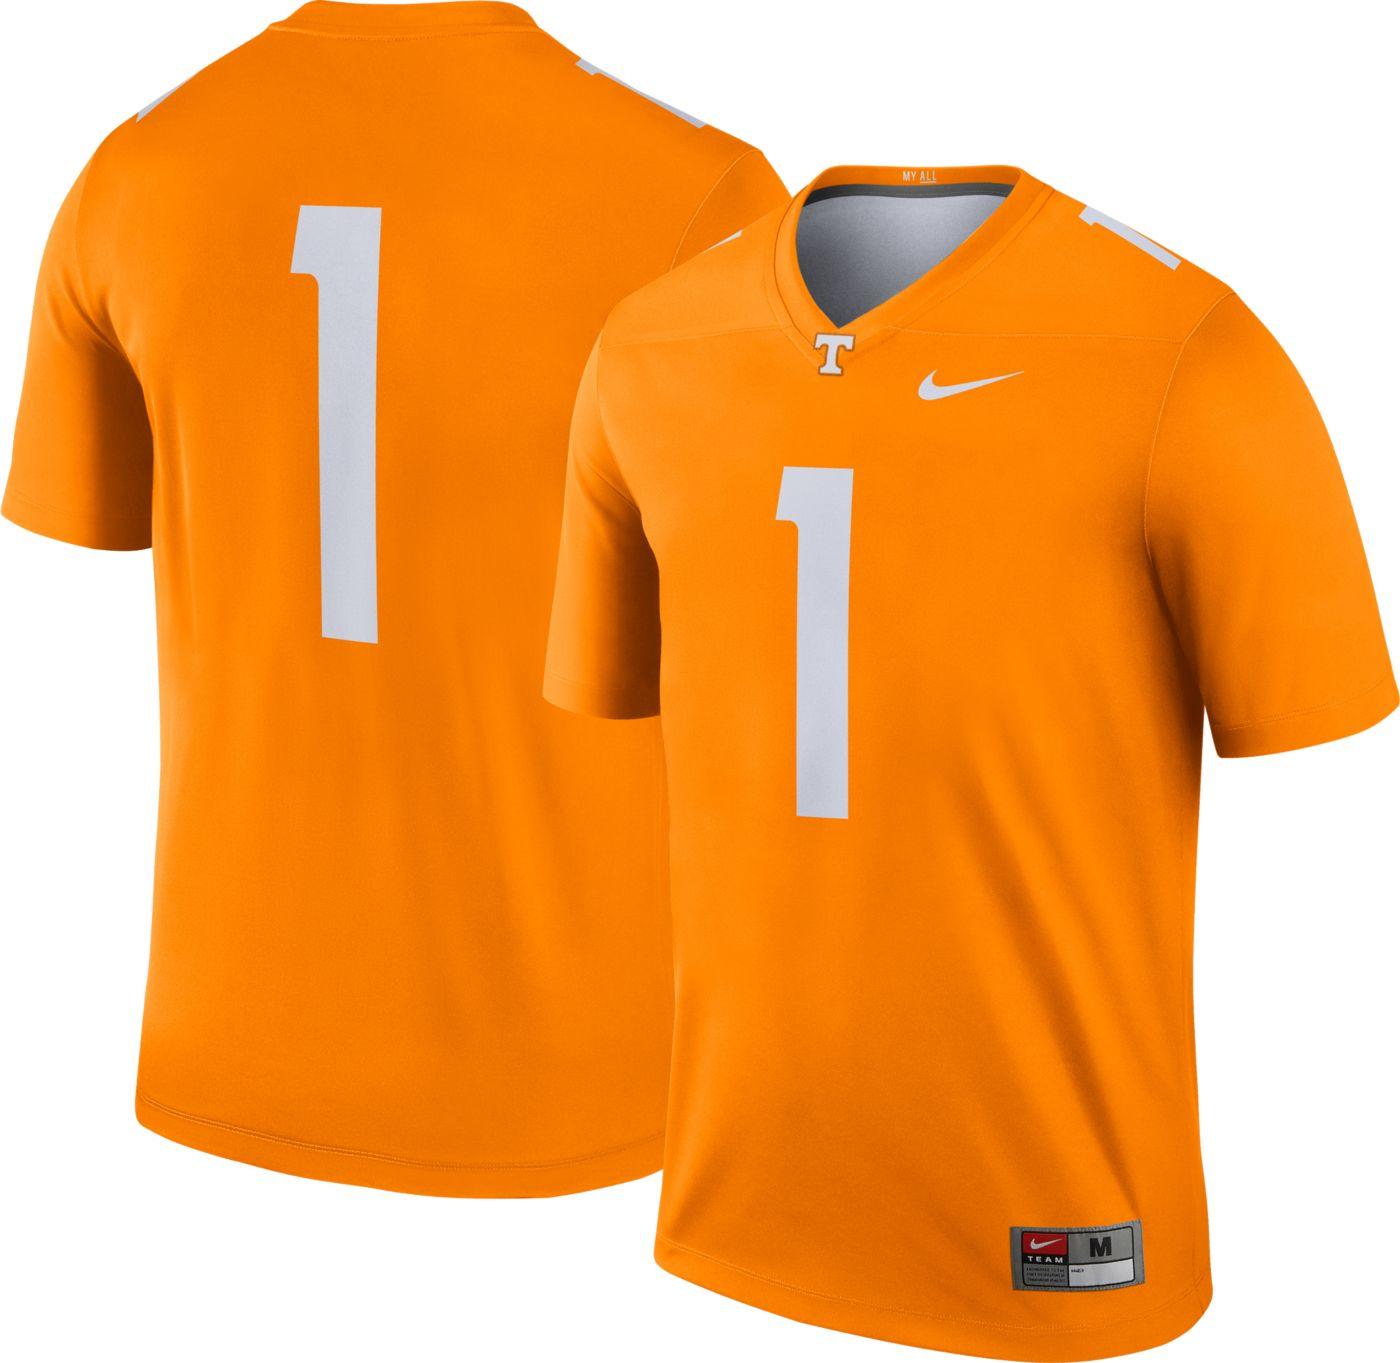 Nike Men's Tennessee Volunteers #1 Tennessee Orange Dri-FIT Legend Football Jersey